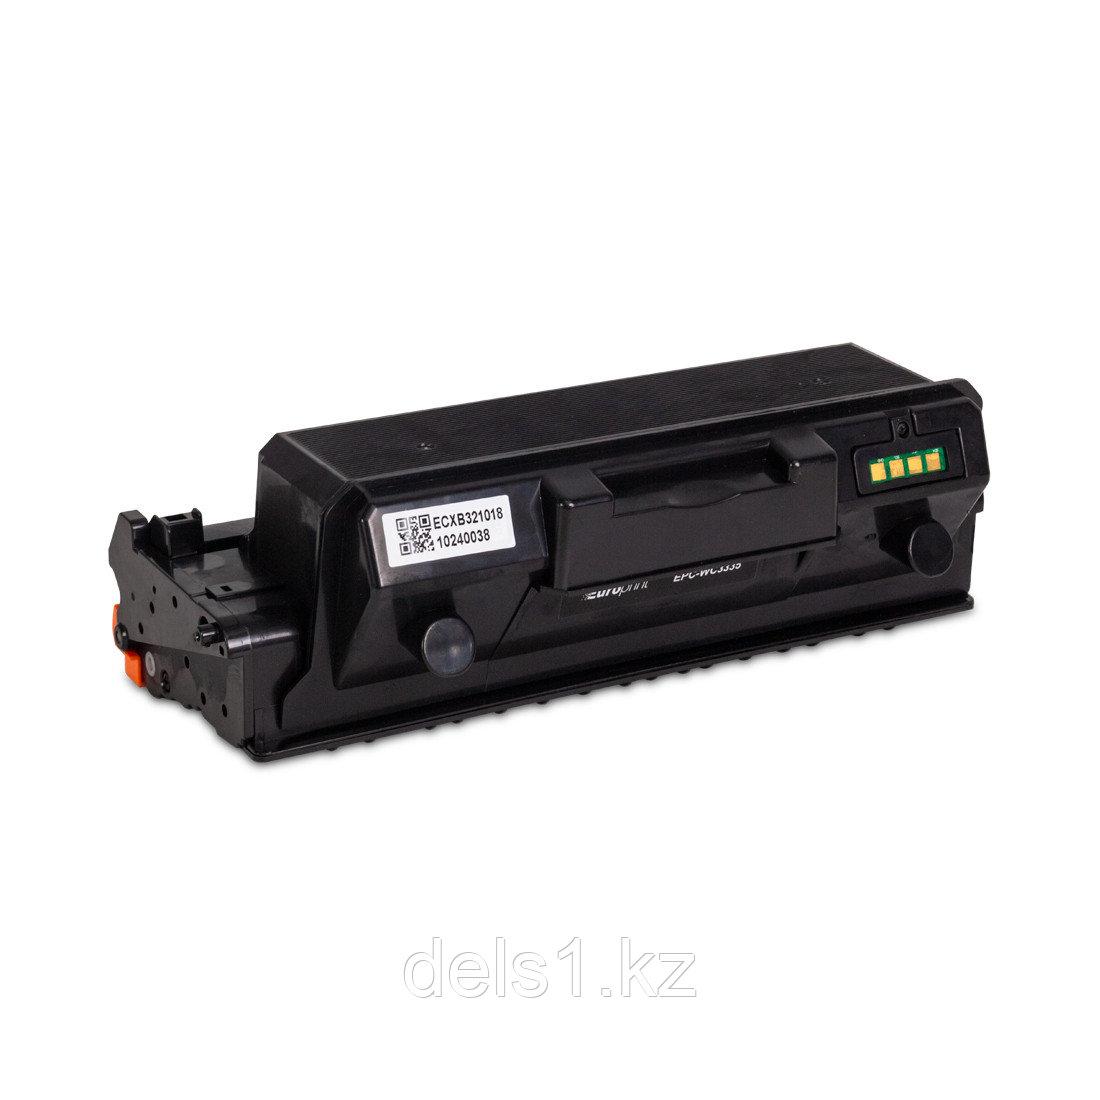 Картридж, Europrint, EPC-WC3335 (106R03623), Для принтеров Xerox Phaser 3330, WorkCentre 3335/3345, 15000 стра